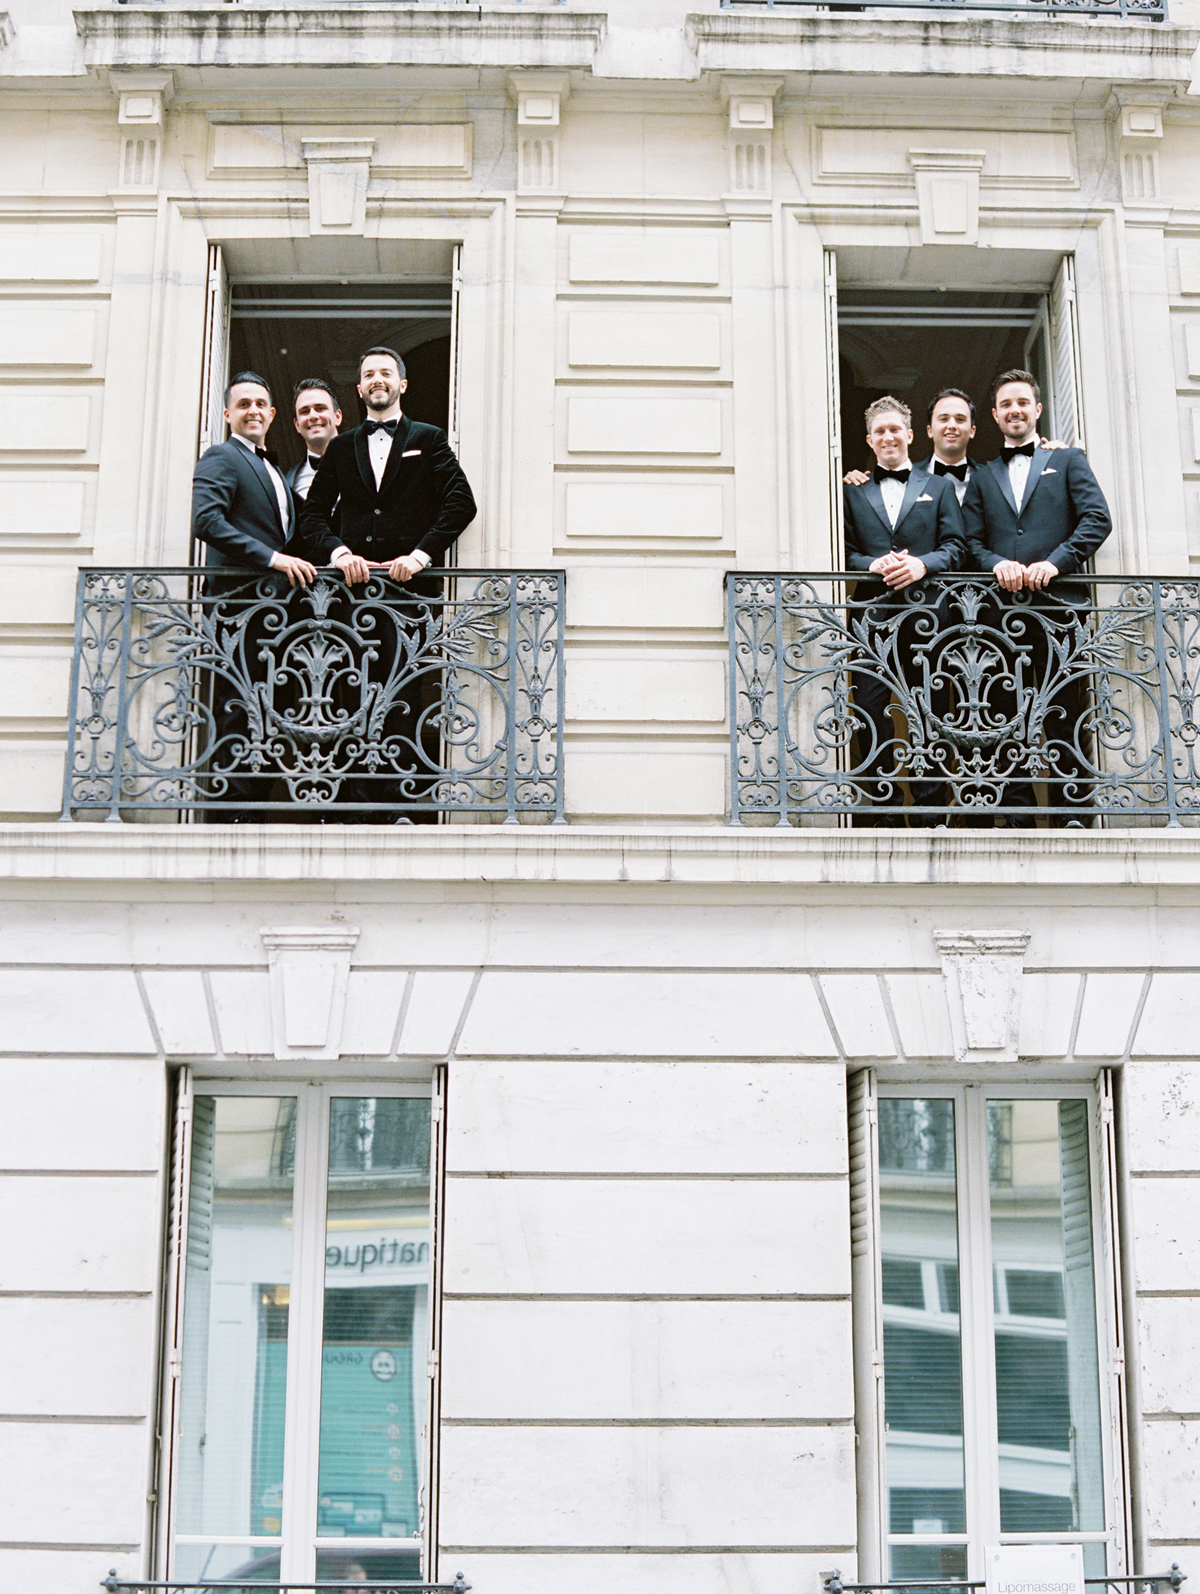 groom and groomsmen posing at window balcony of parisian building